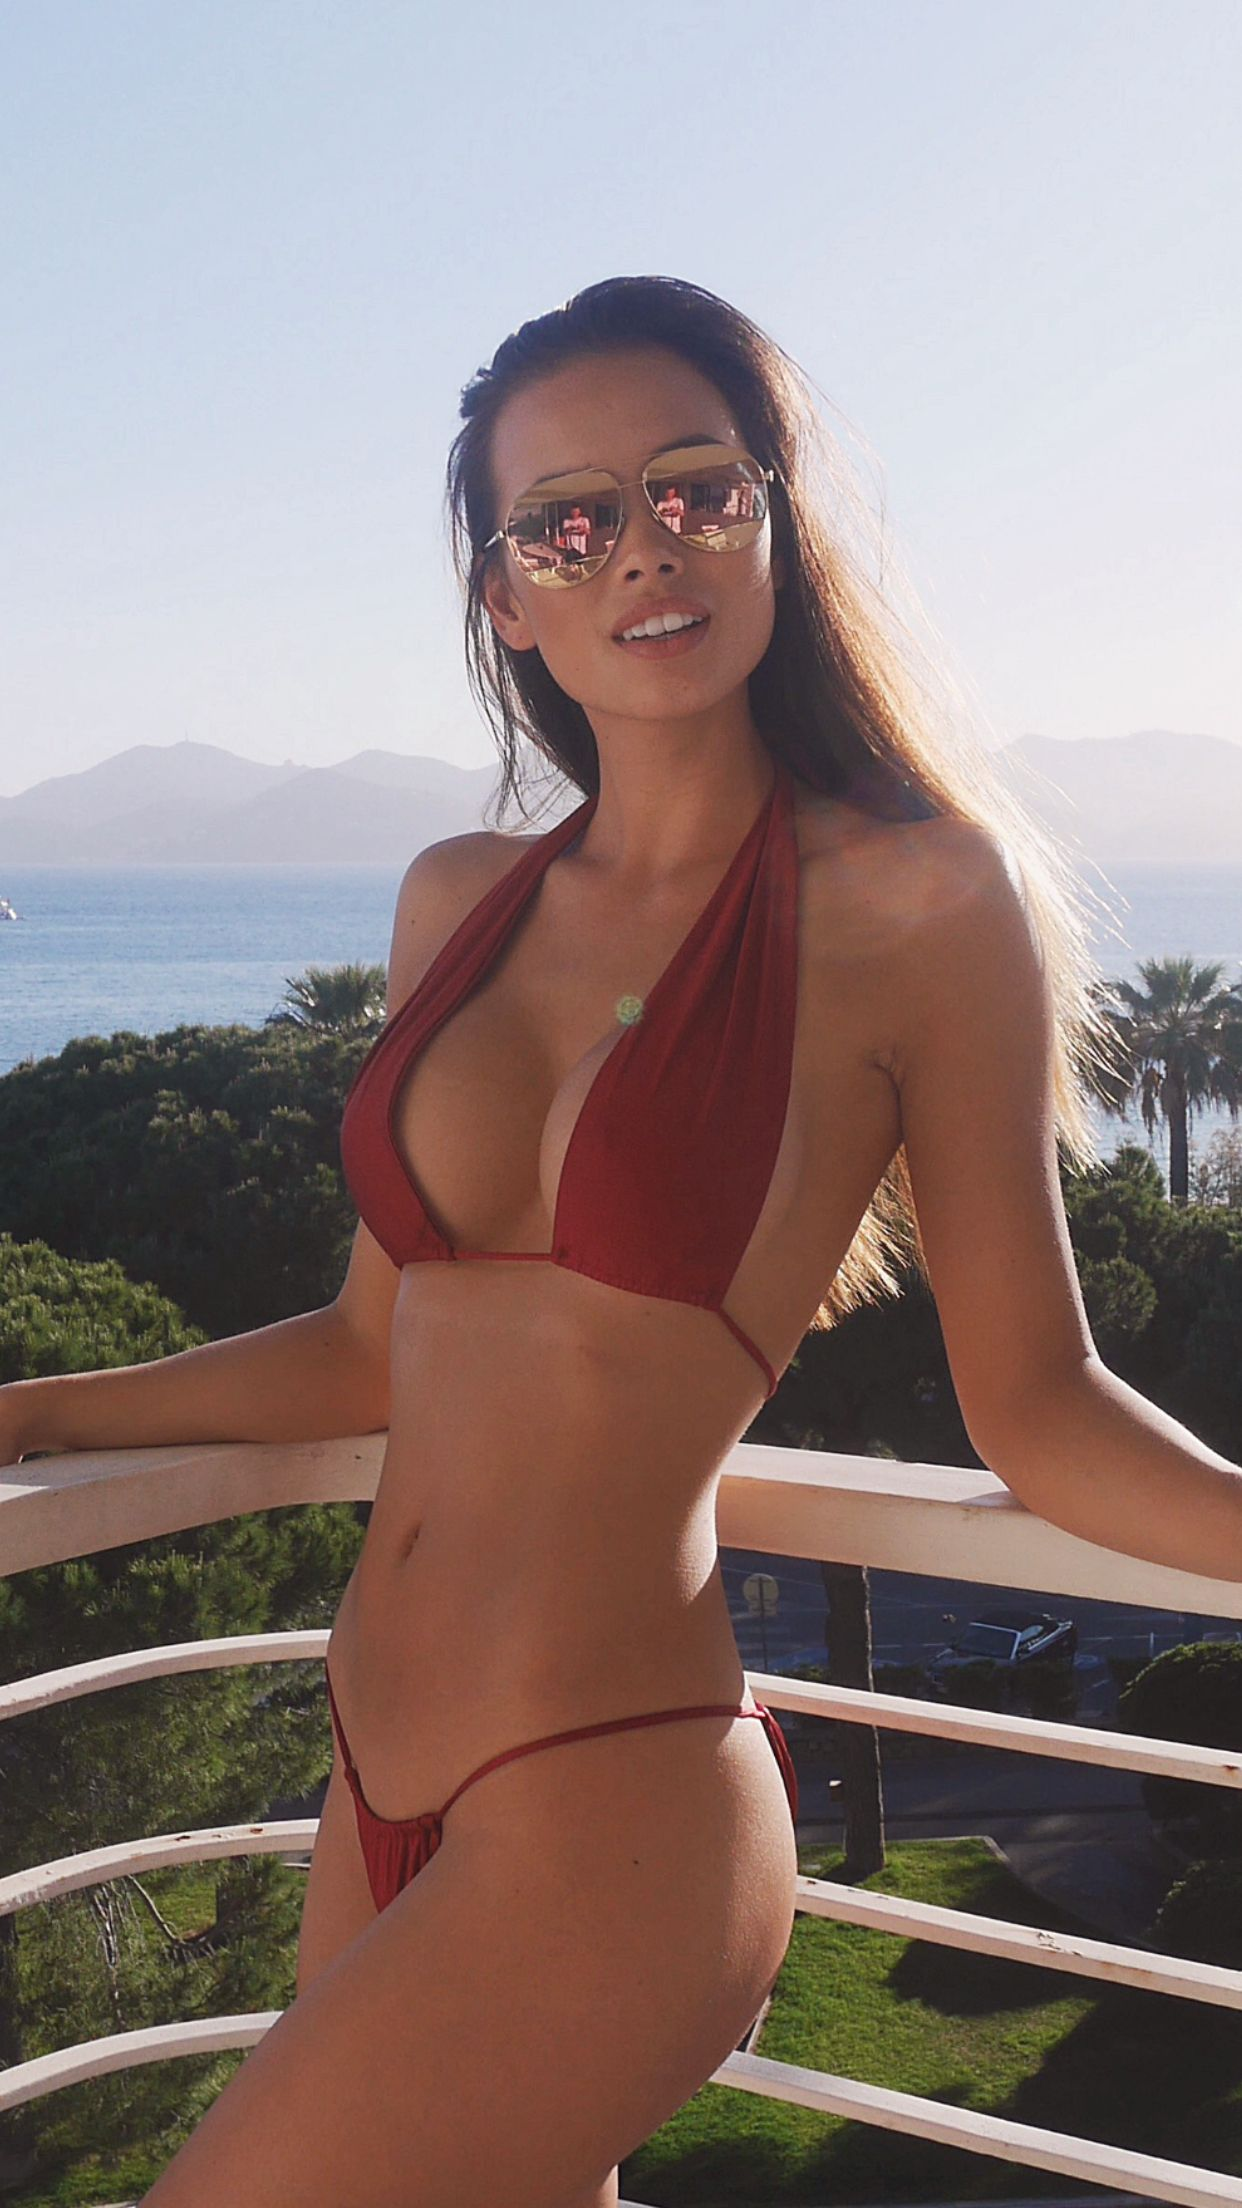 Sideboobs Erotica Jasmin Tabatabai  naked (26 images), YouTube, braless